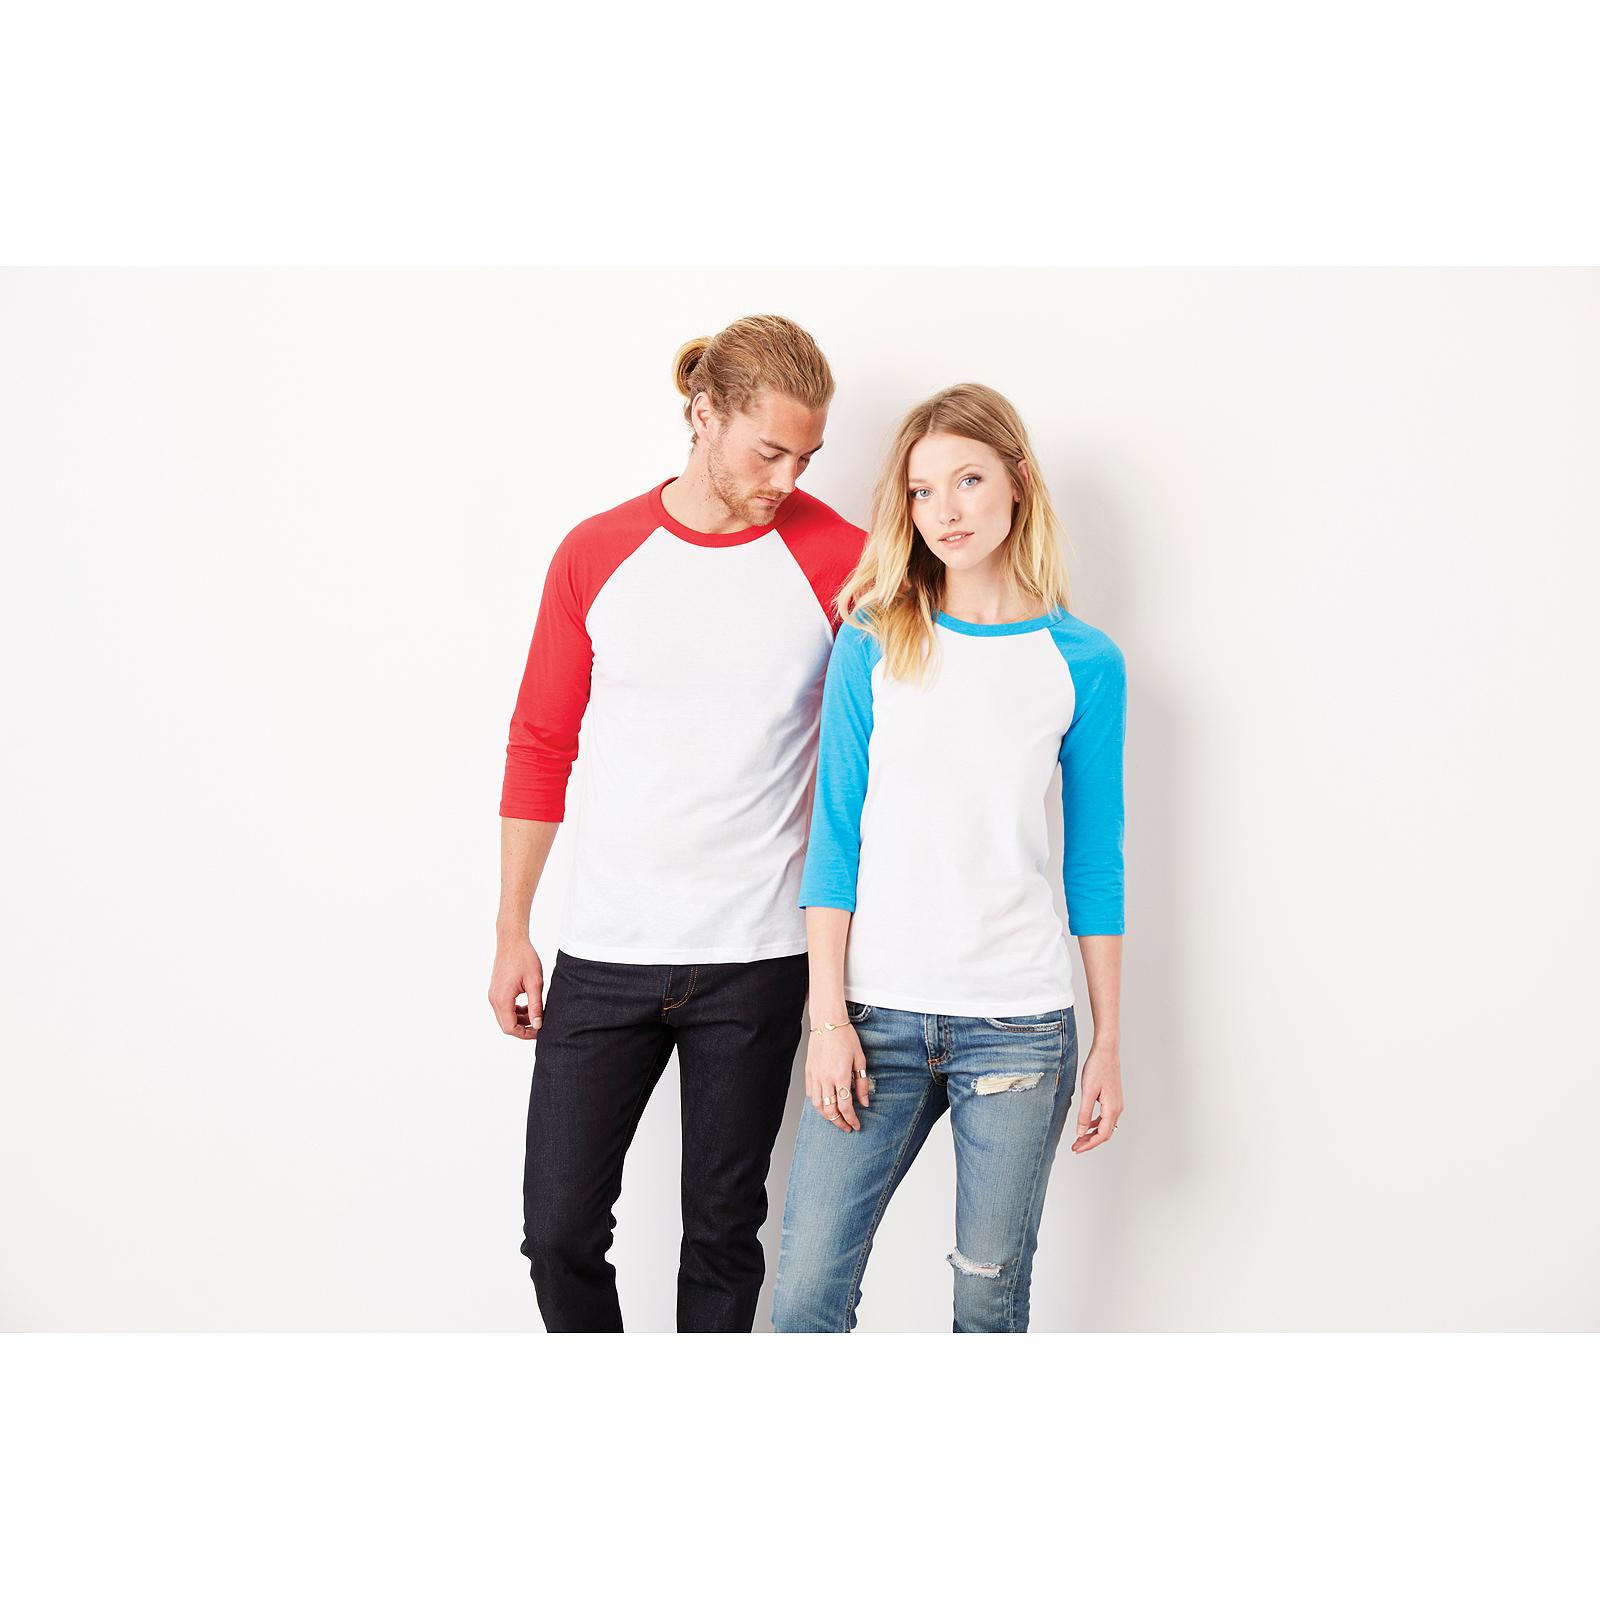 a4eea4c6fa2 Sentinel Canvas Unisex 3 4 Sleeve Baseball T-Shirt Bound Neck Triblend Slim  Fit Tee